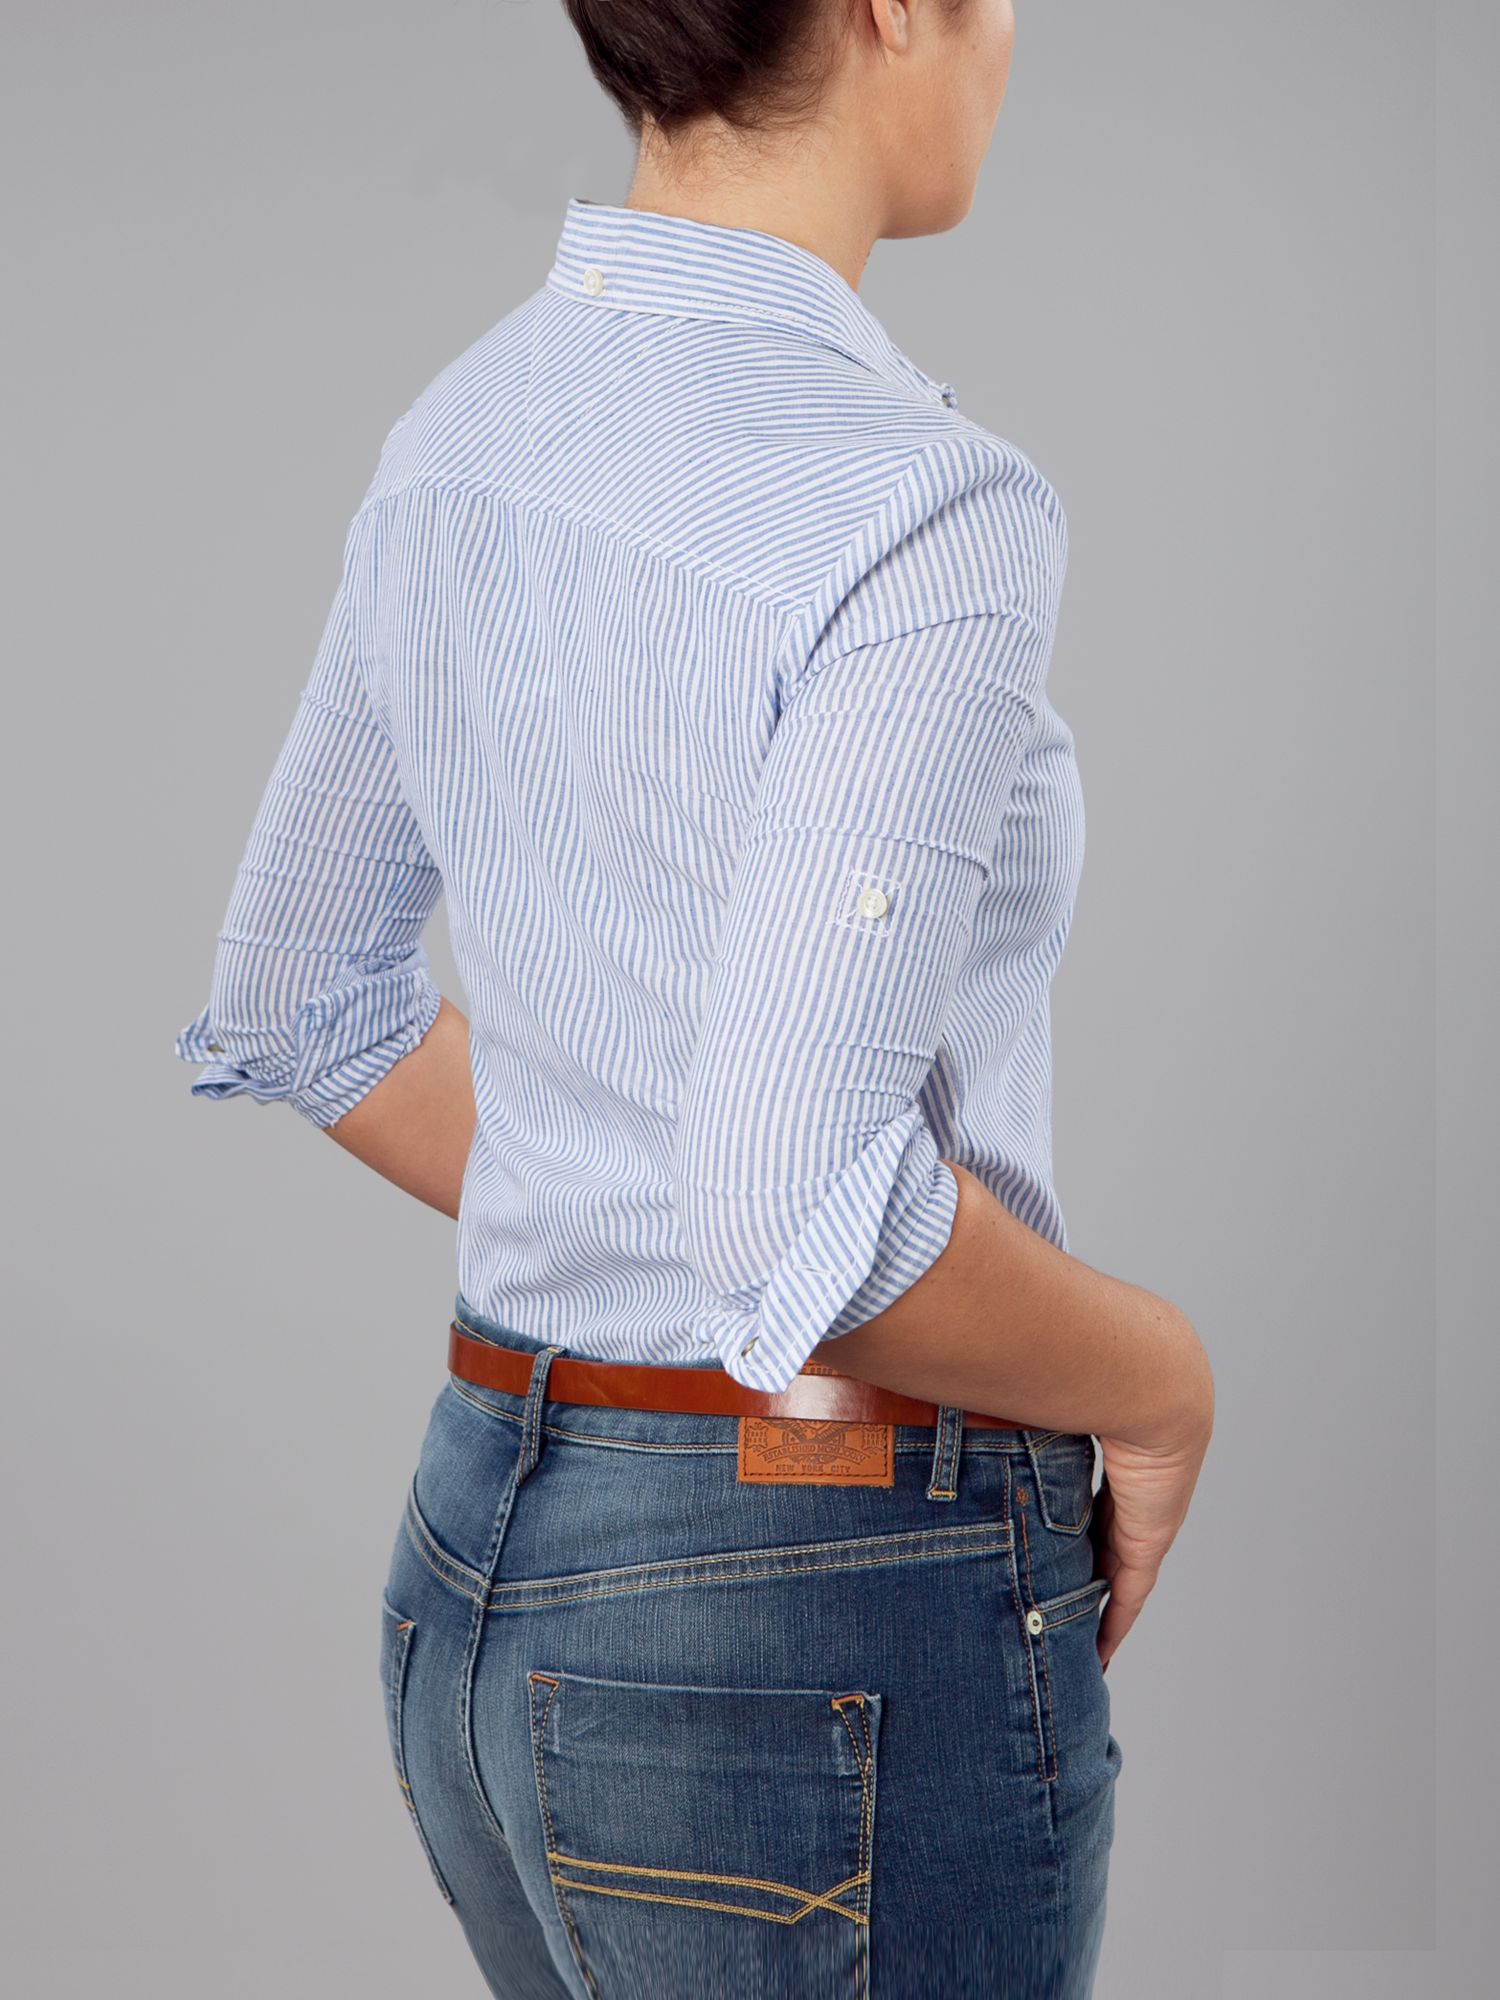 Lyst tommy hilfiger holly long sleeved fine stripe shirt for Tommy hilfiger fitzgerald striped shirt